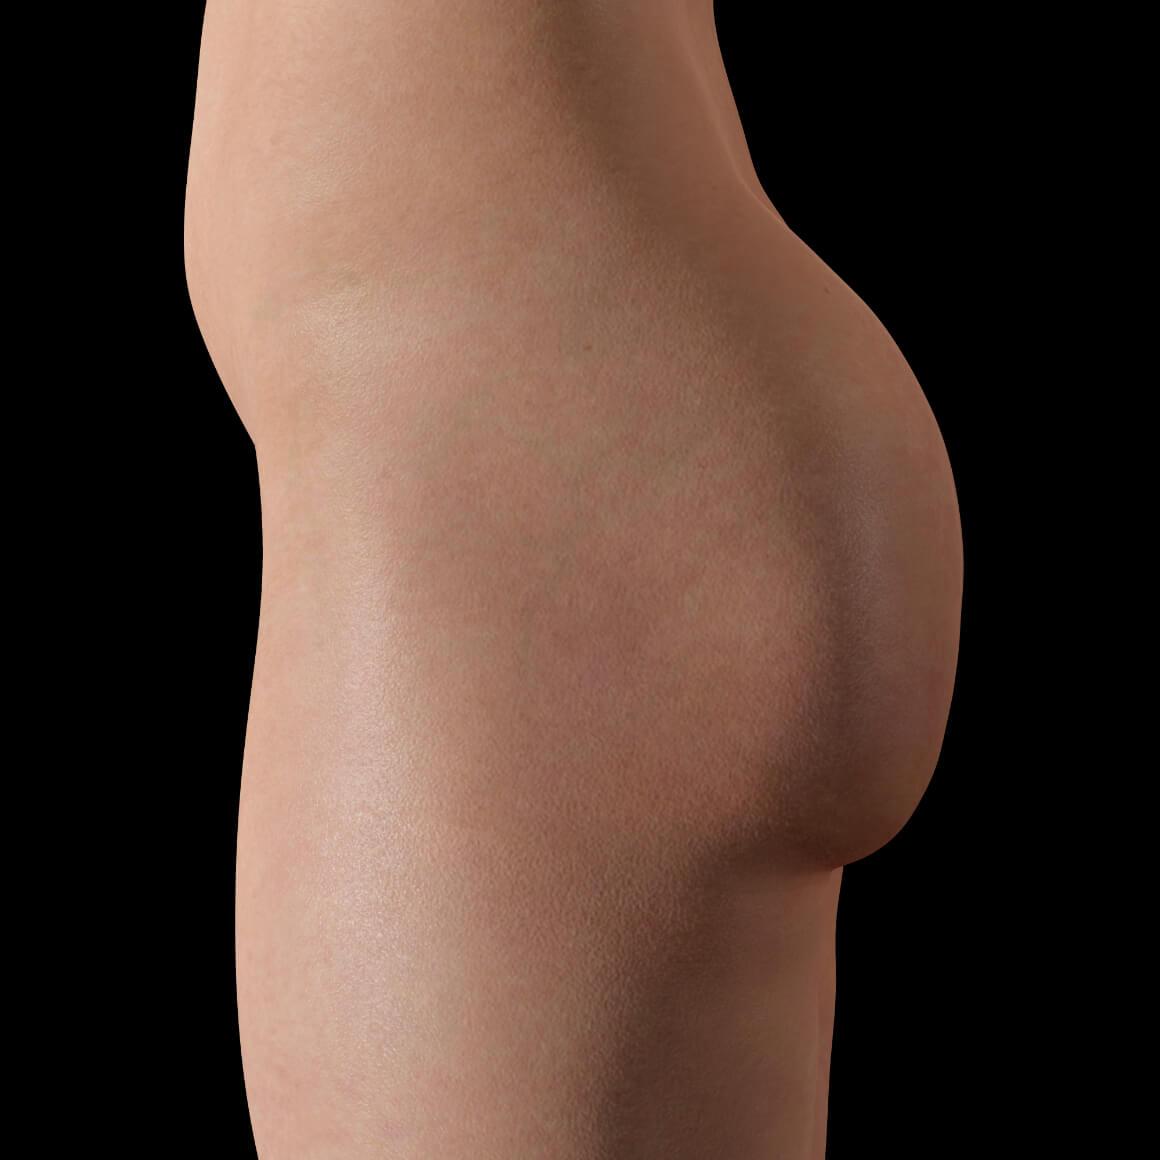 Female patient from Clinique Chloé positioned sideways after a Venus Legacy cellulite treatment